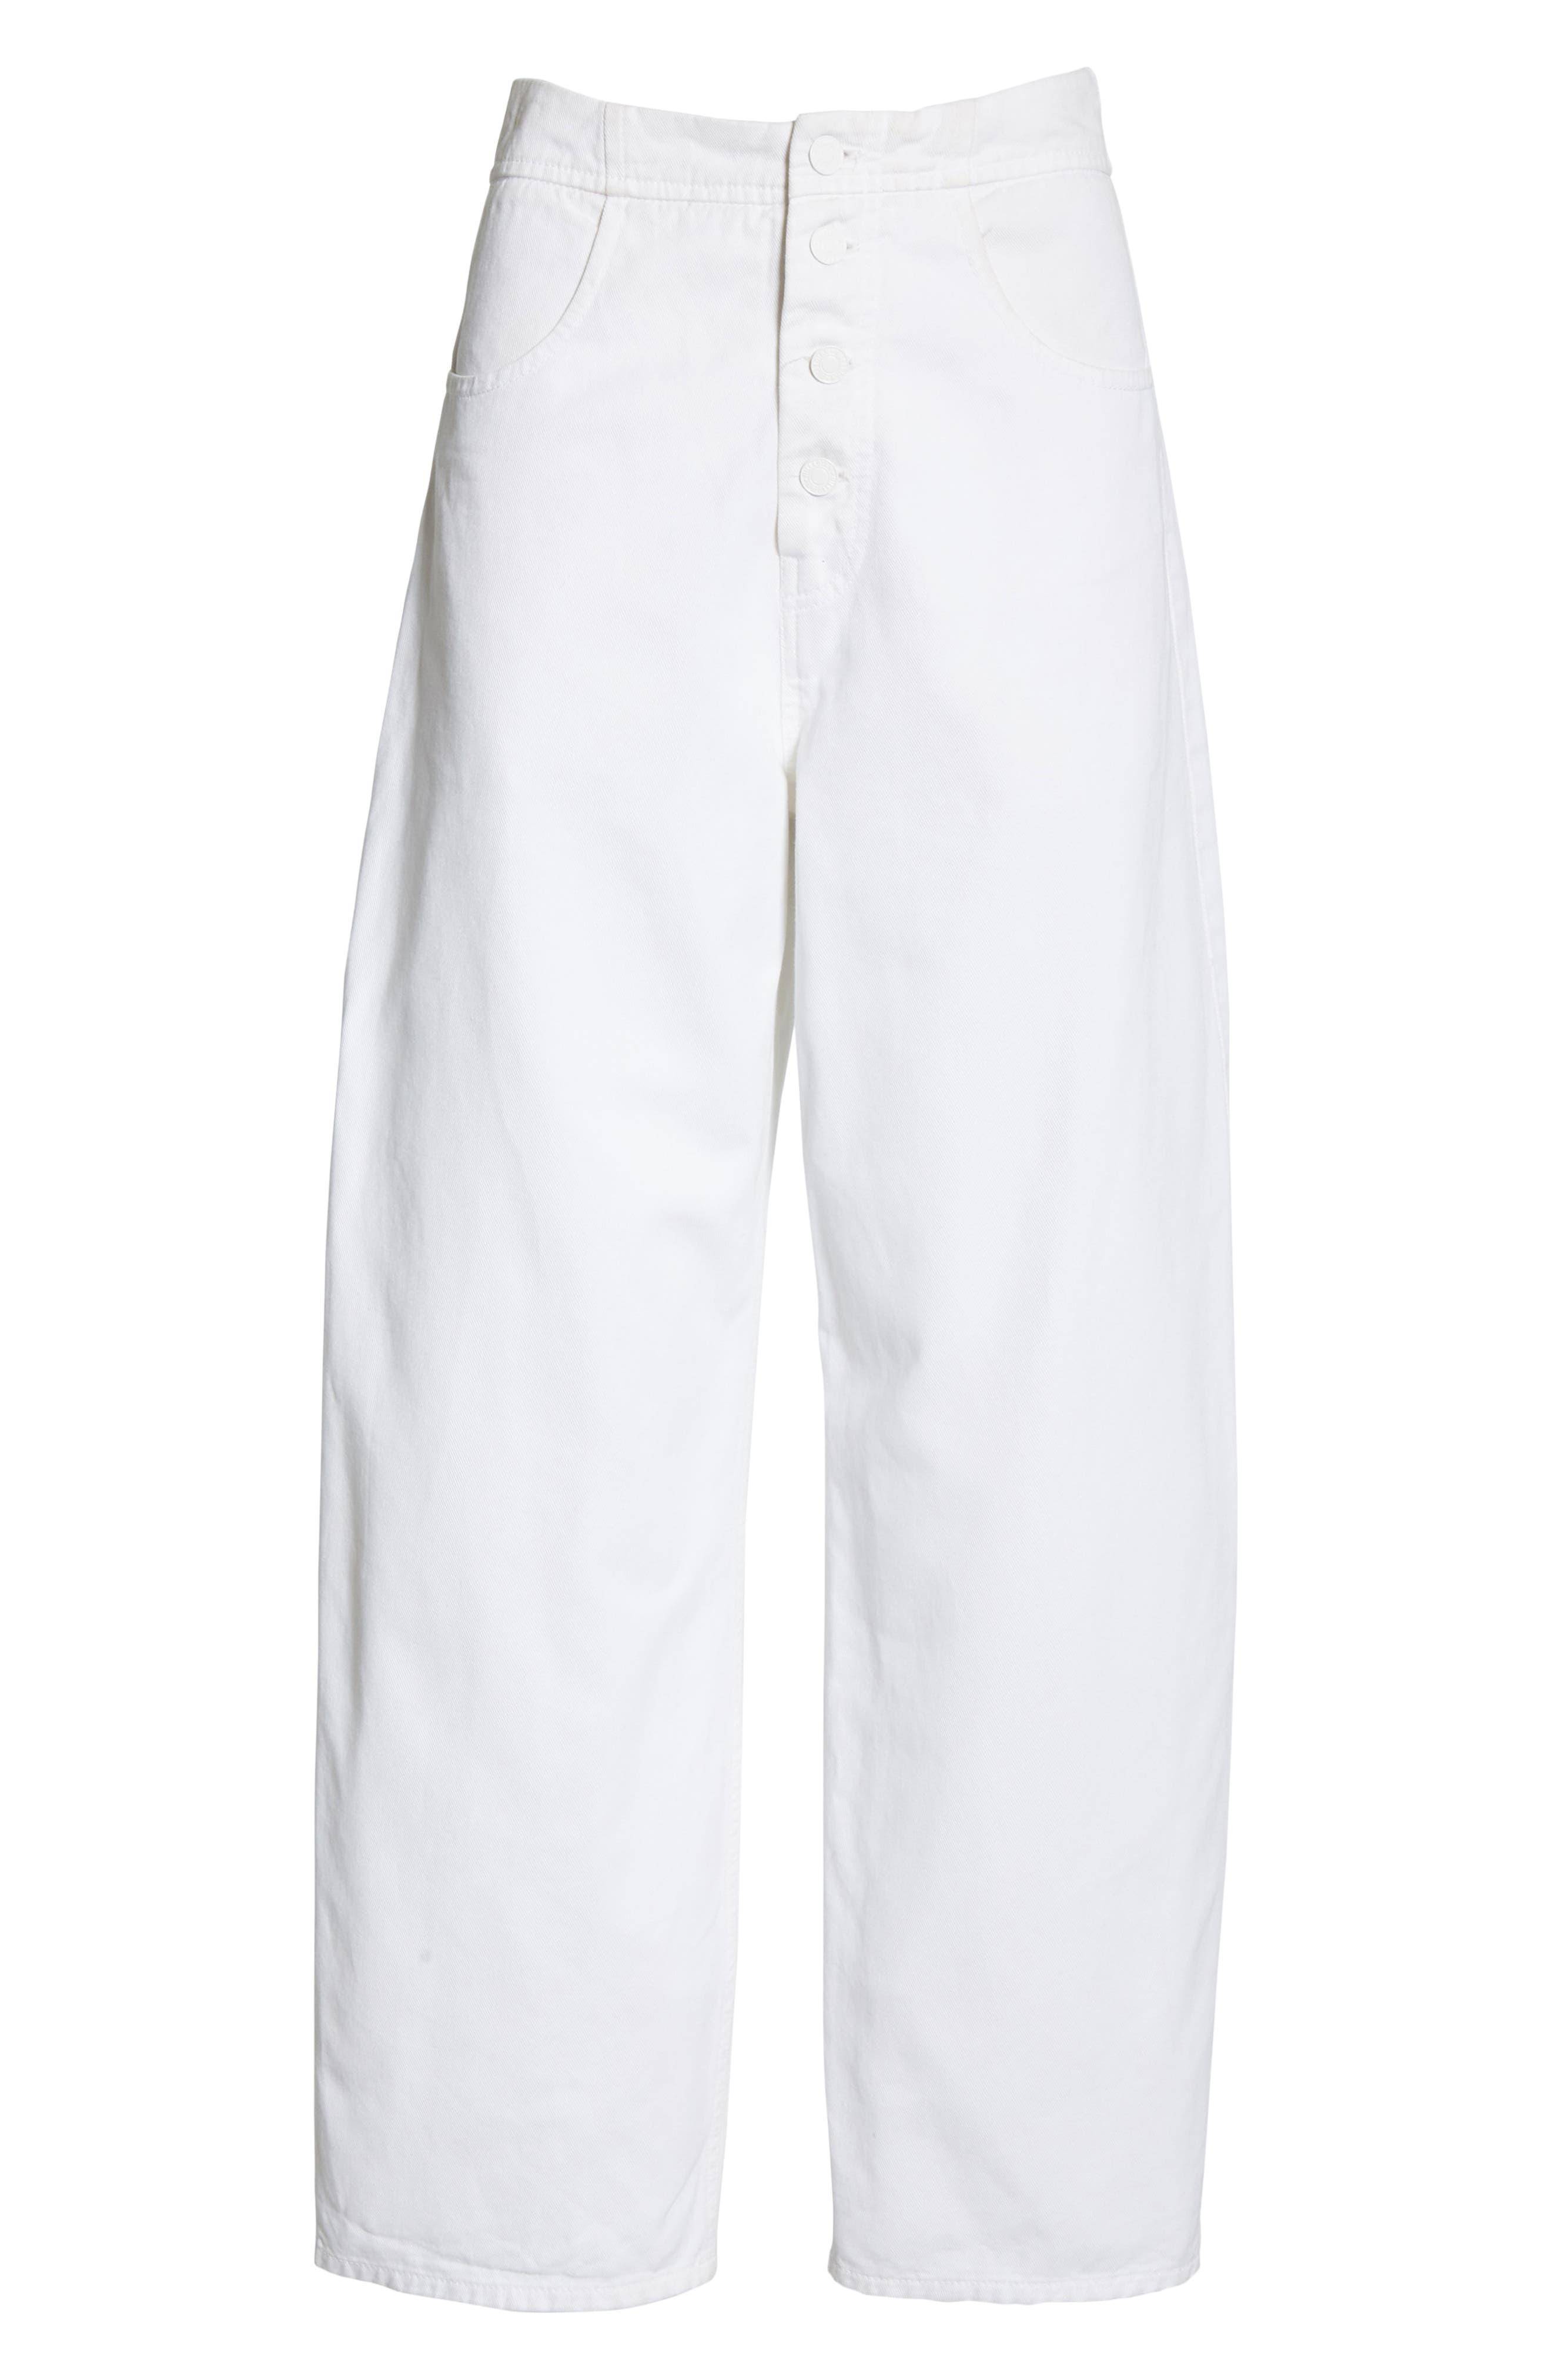 NILI LOTAN, Toledo Crop Cotton Pants, Alternate thumbnail 7, color, VINTAGE WHITE